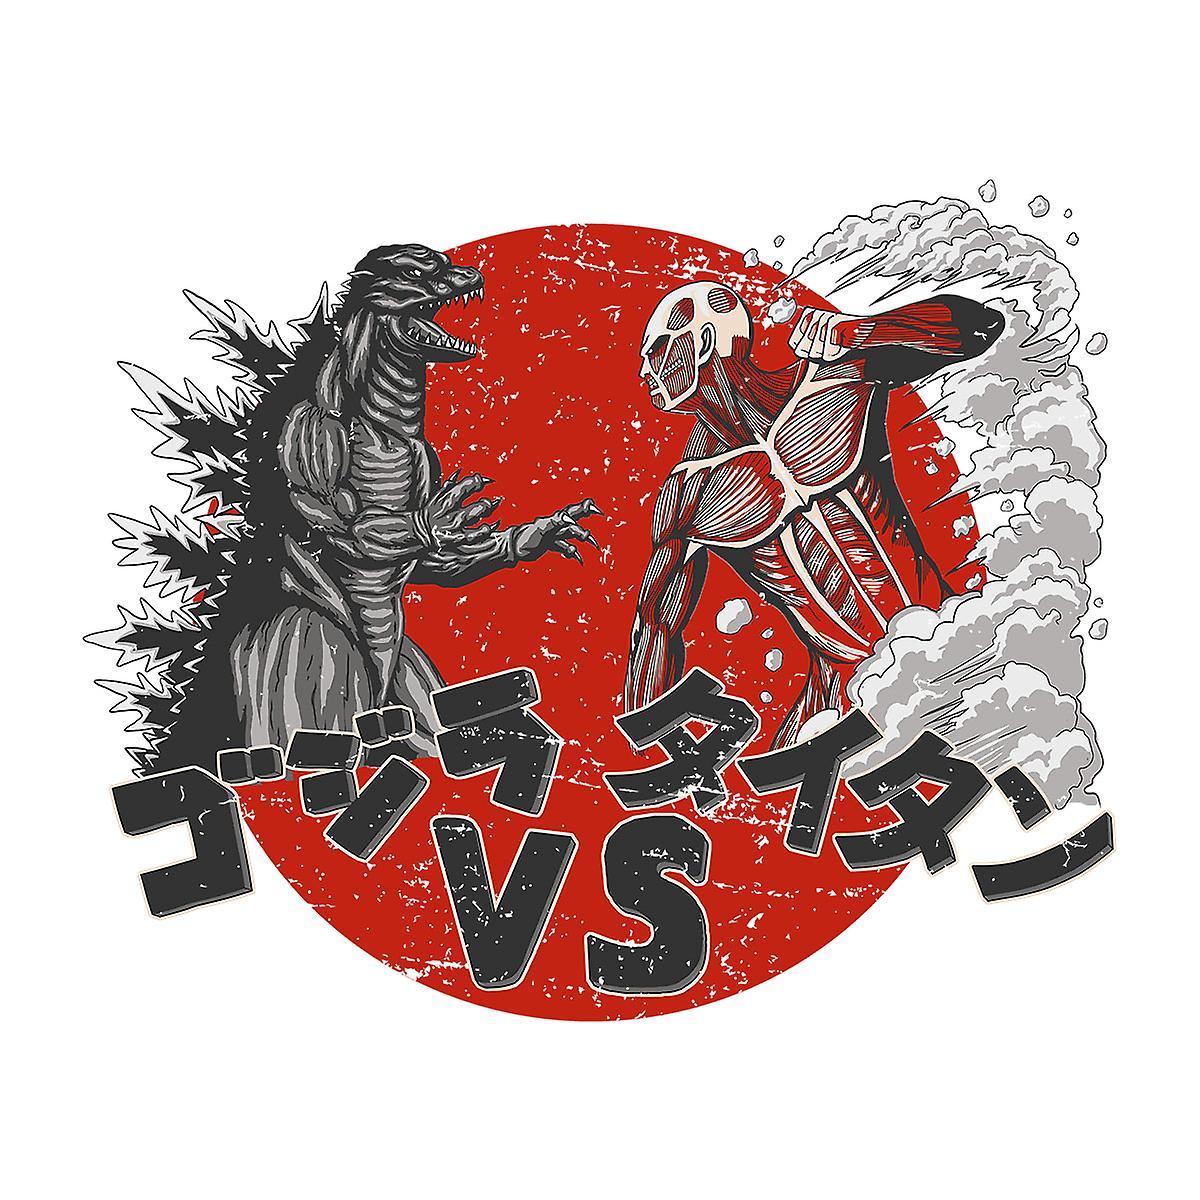 Godzilla Vs Titan Angriff Auf Titan Herren Baseball T